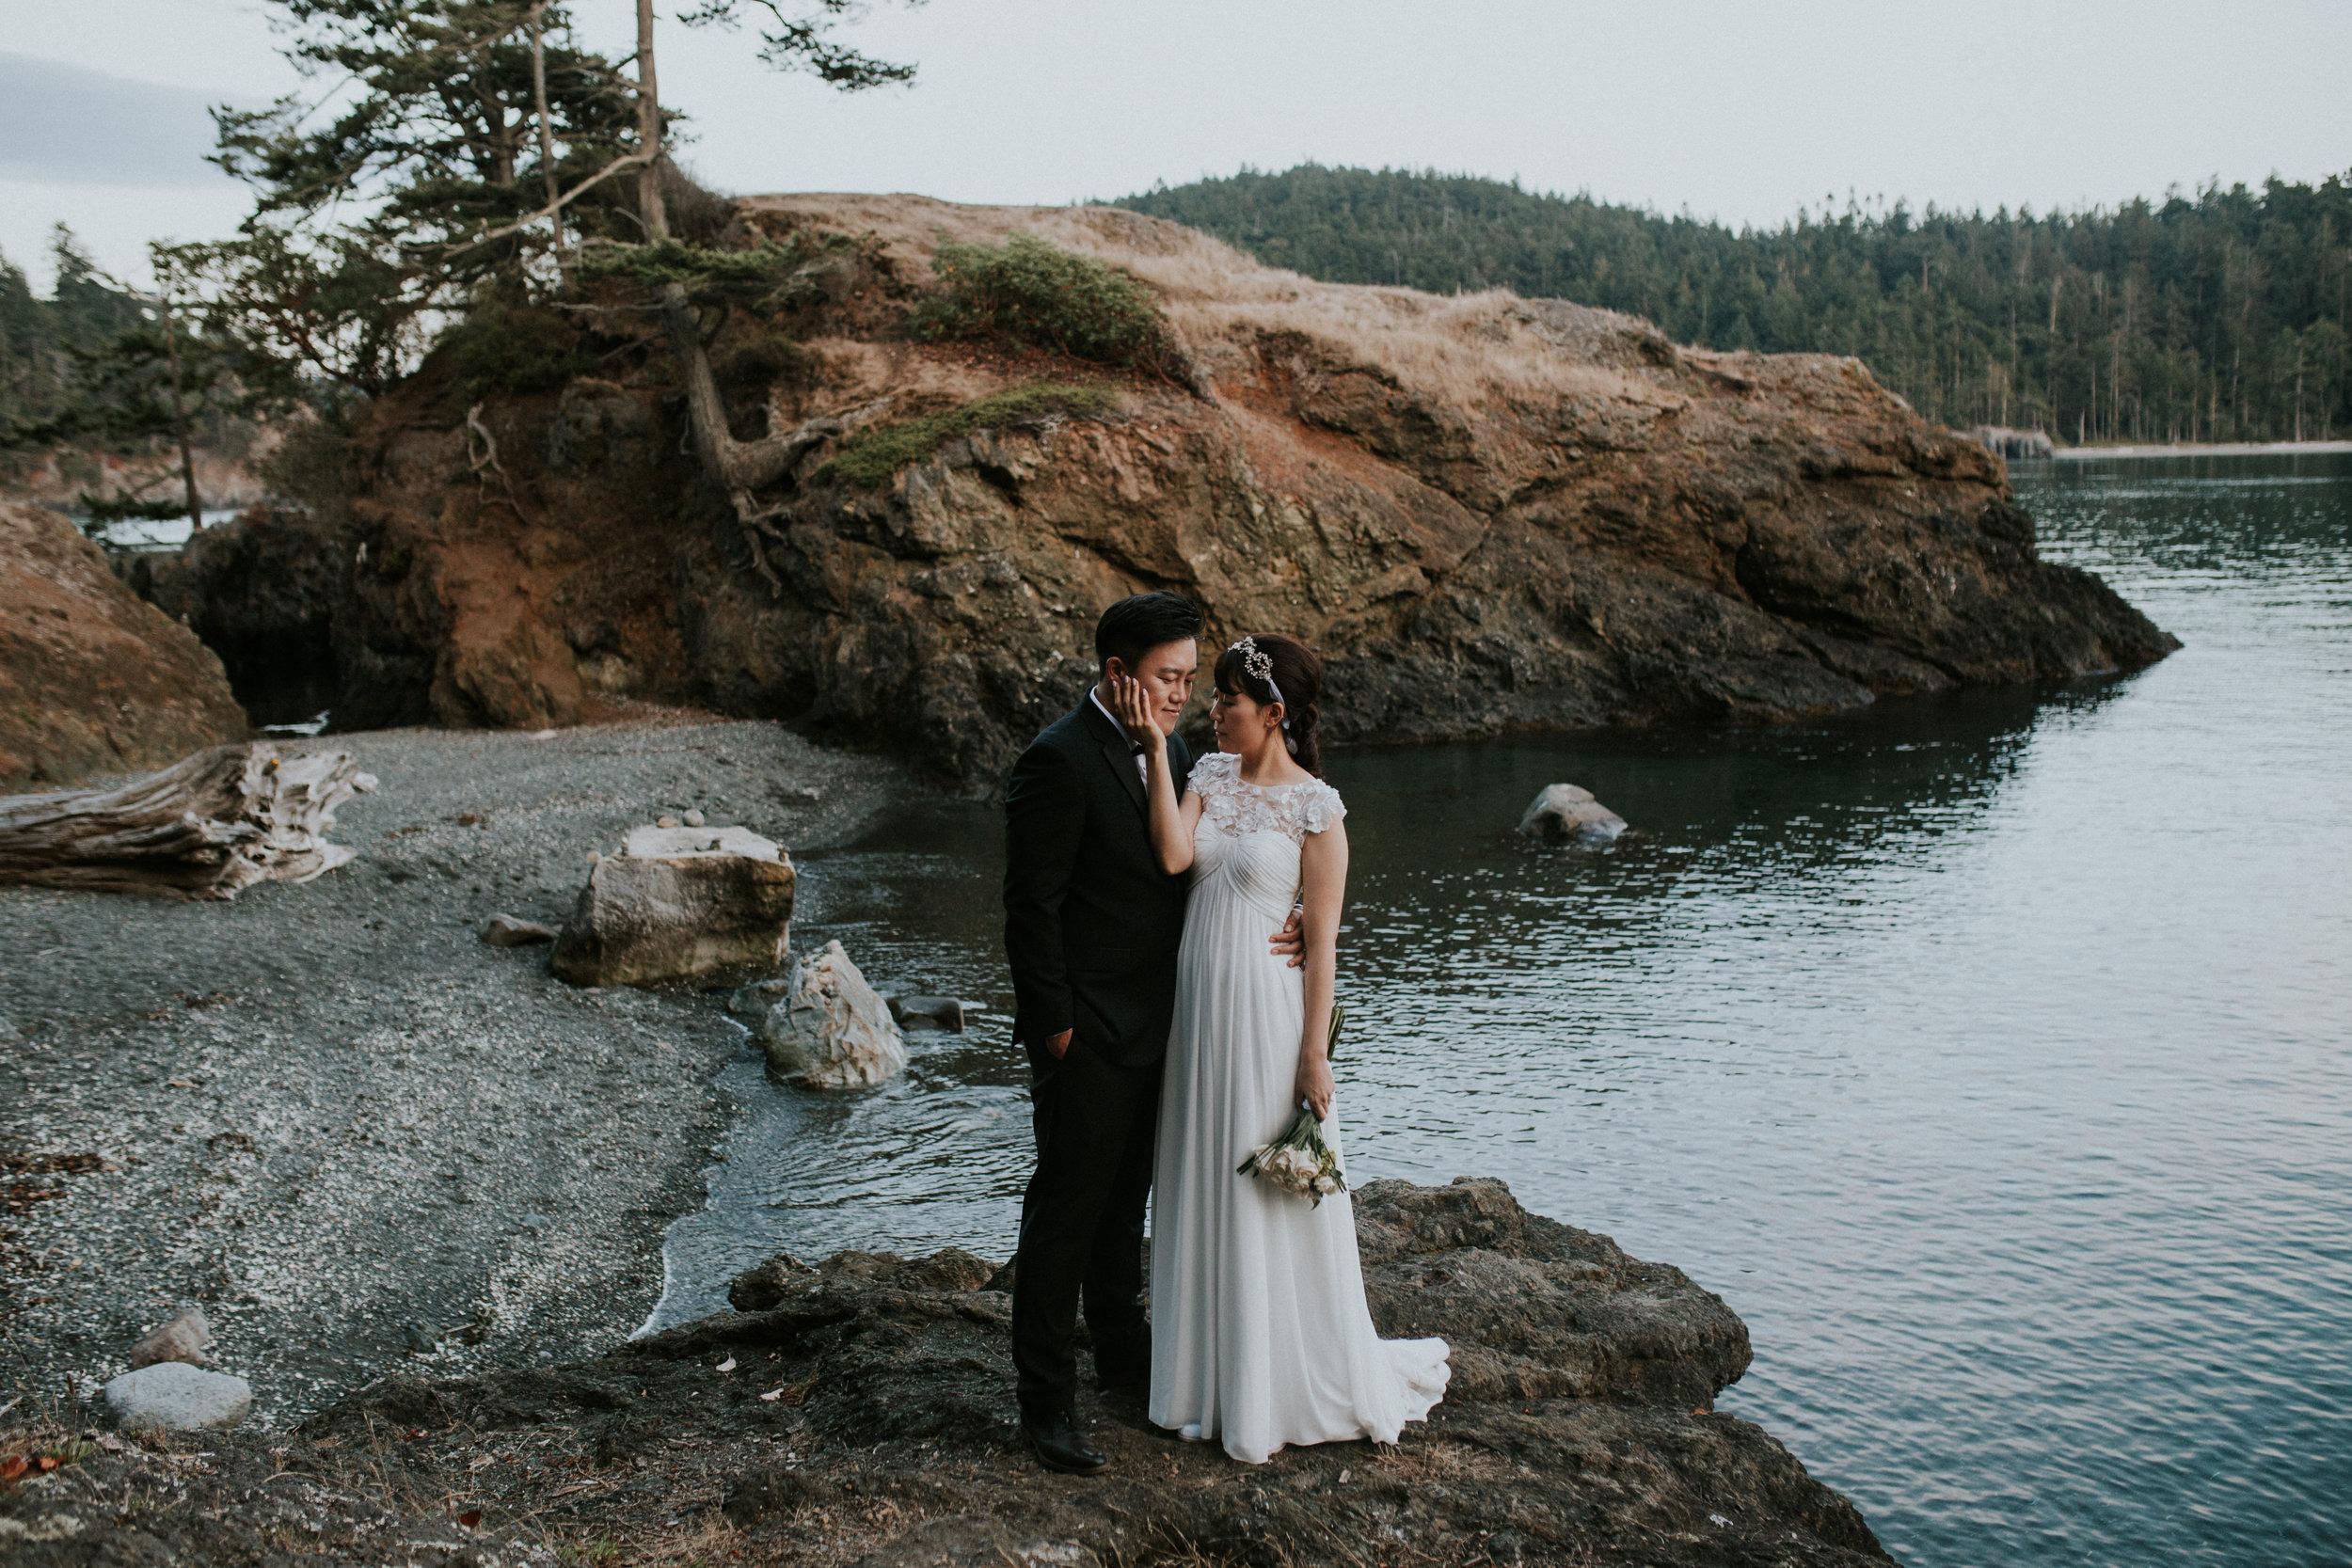 destination wedding photography in Seattle